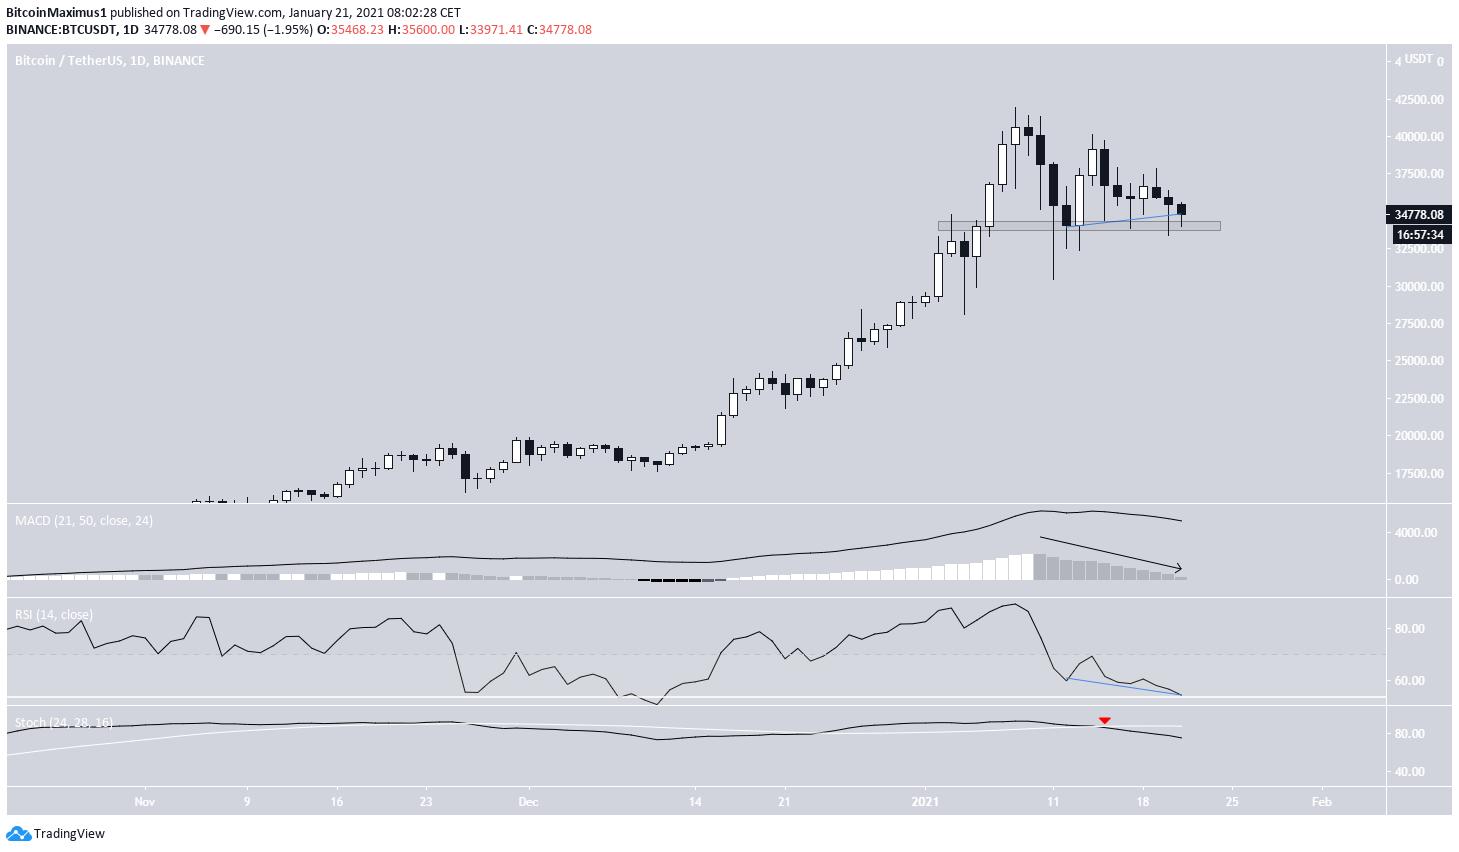 BTC Divergence